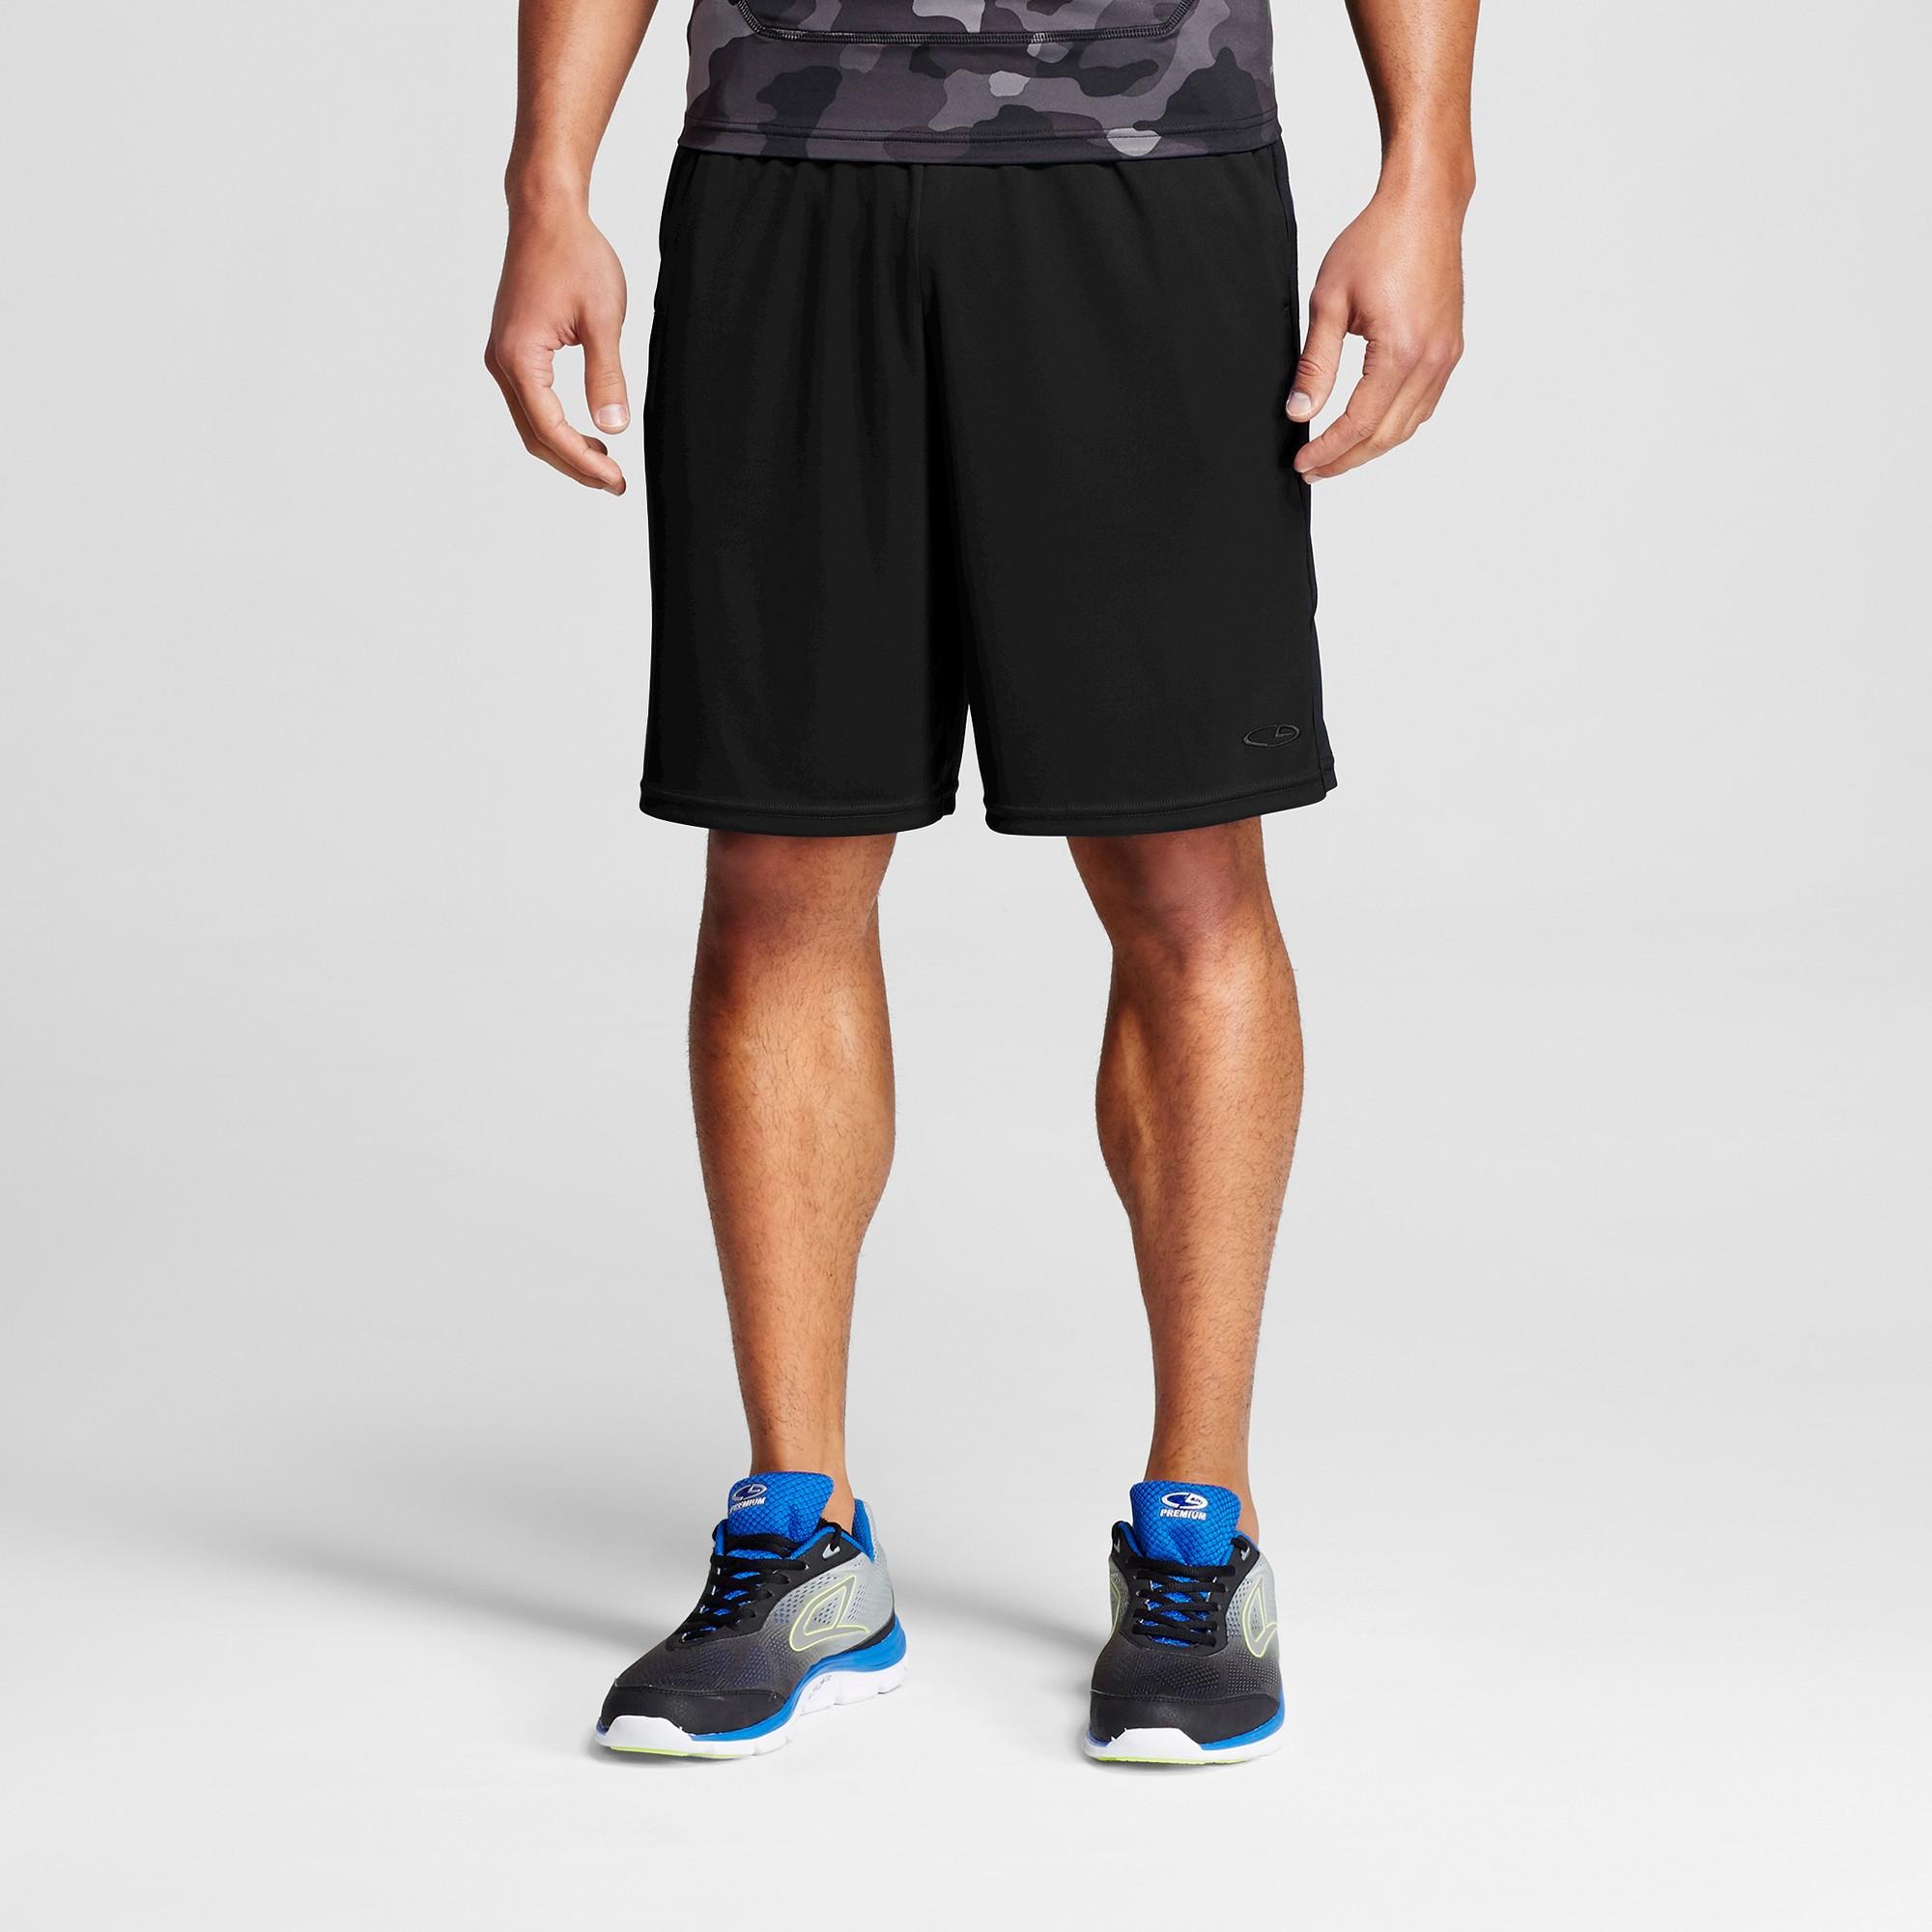 490f05f6e1f Men s 10 Circuit Training Shorts - C9 Champion Black XL